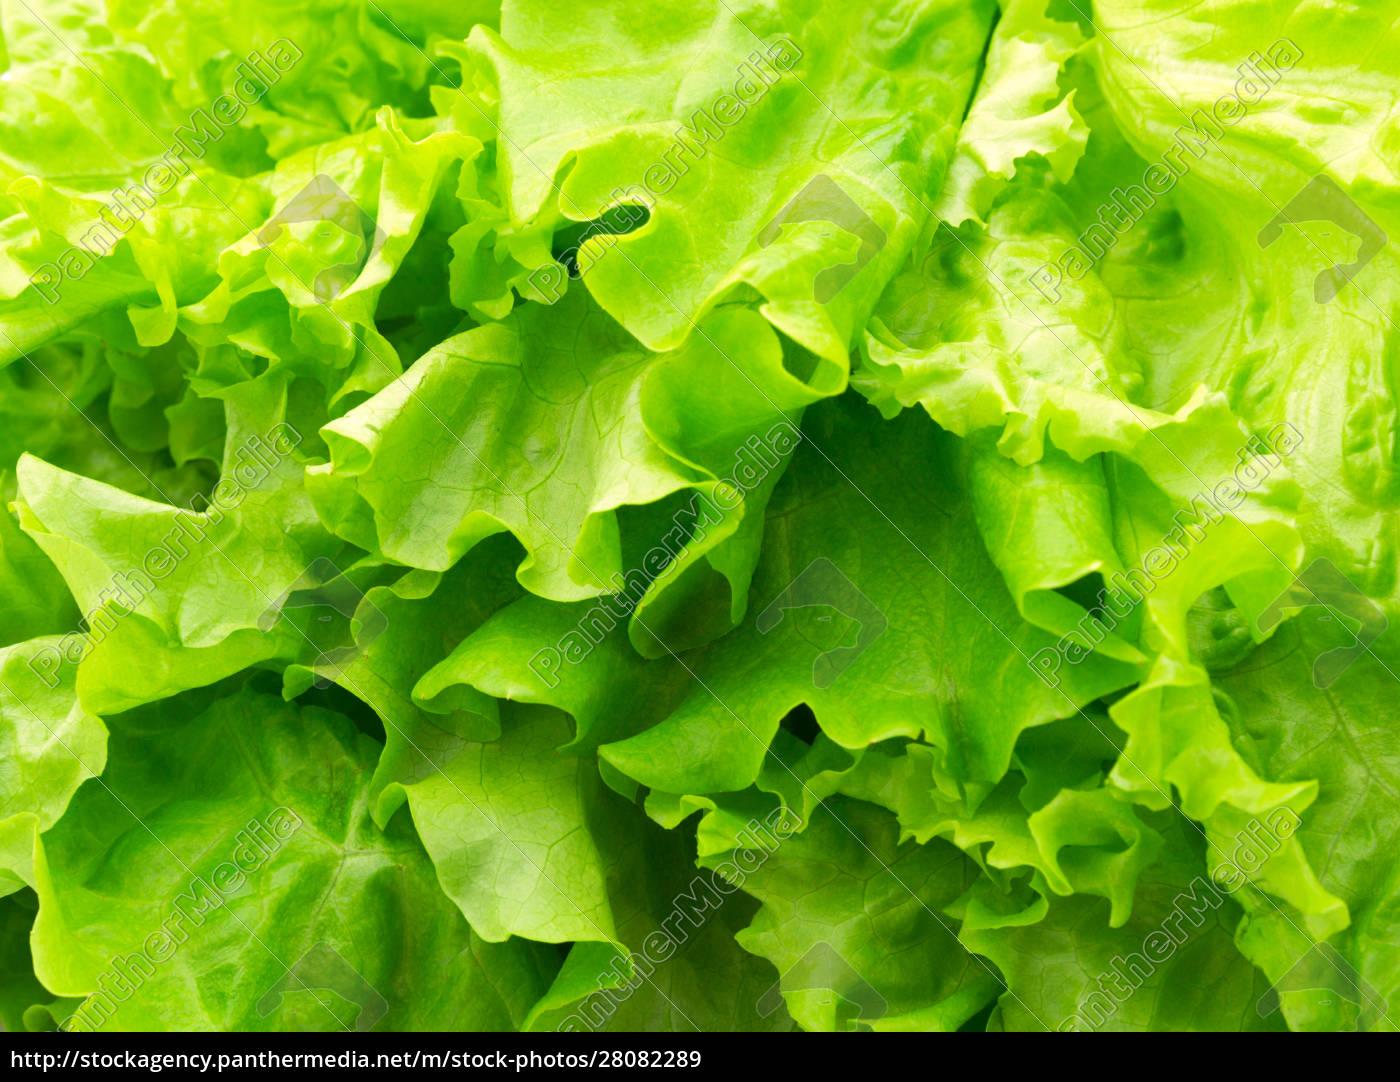 green, salad - 28082289